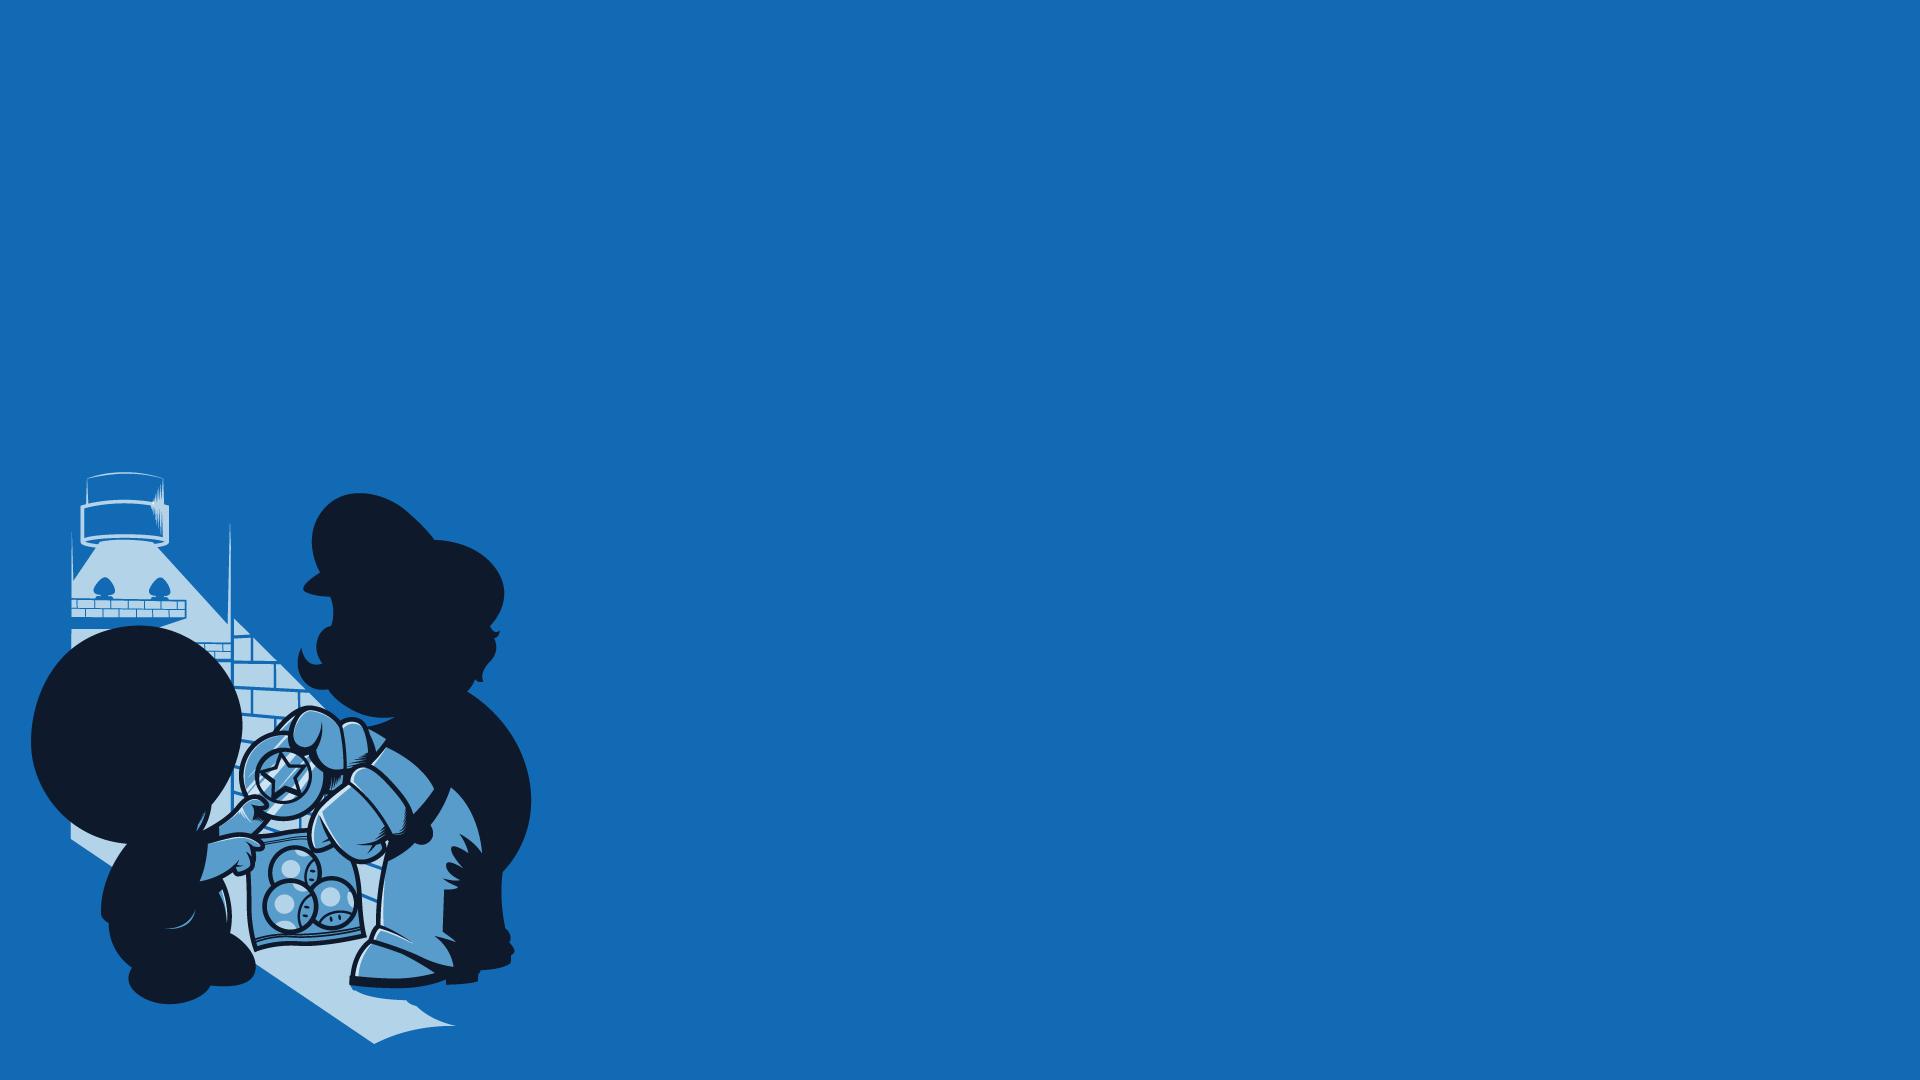 Cute Stitch Desktop Wallpaper Minimal Super Mario Wallpaper Let S Talk About